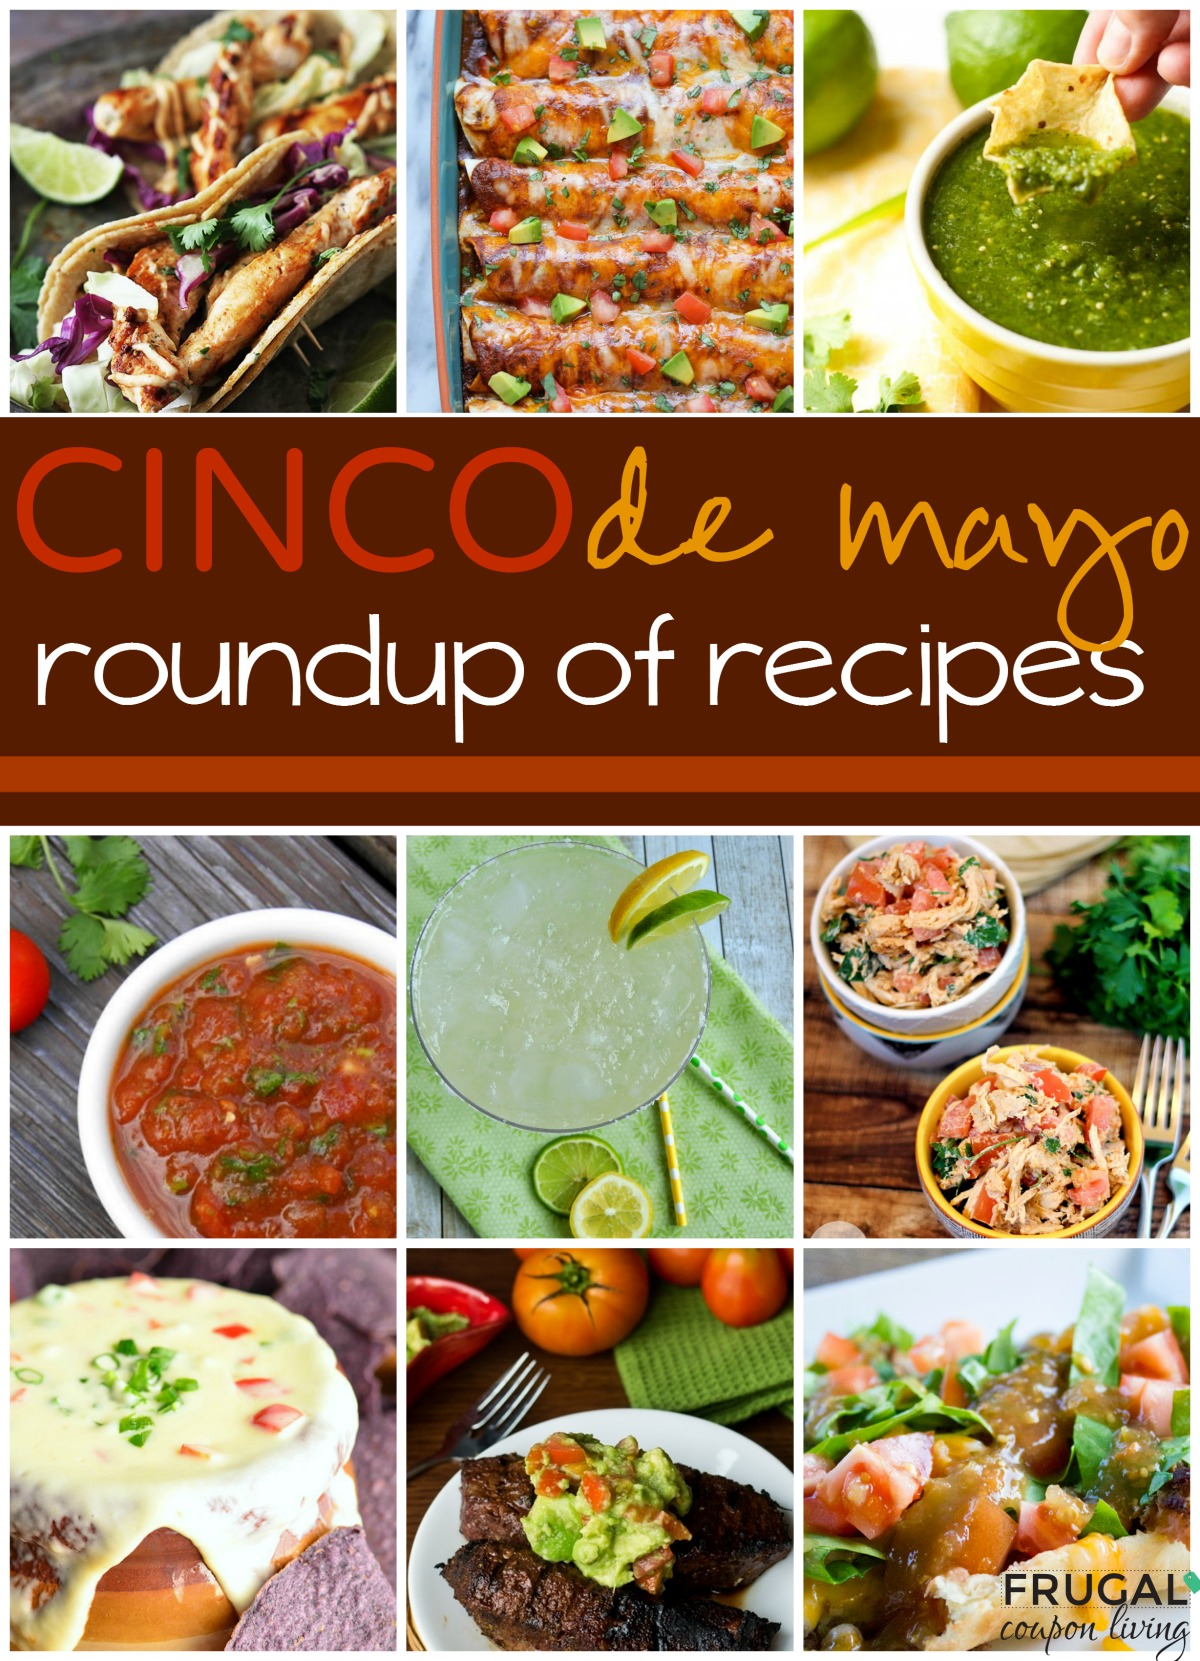 cinco-de-mayo-rounduup-recipes-frugal-coupon-living